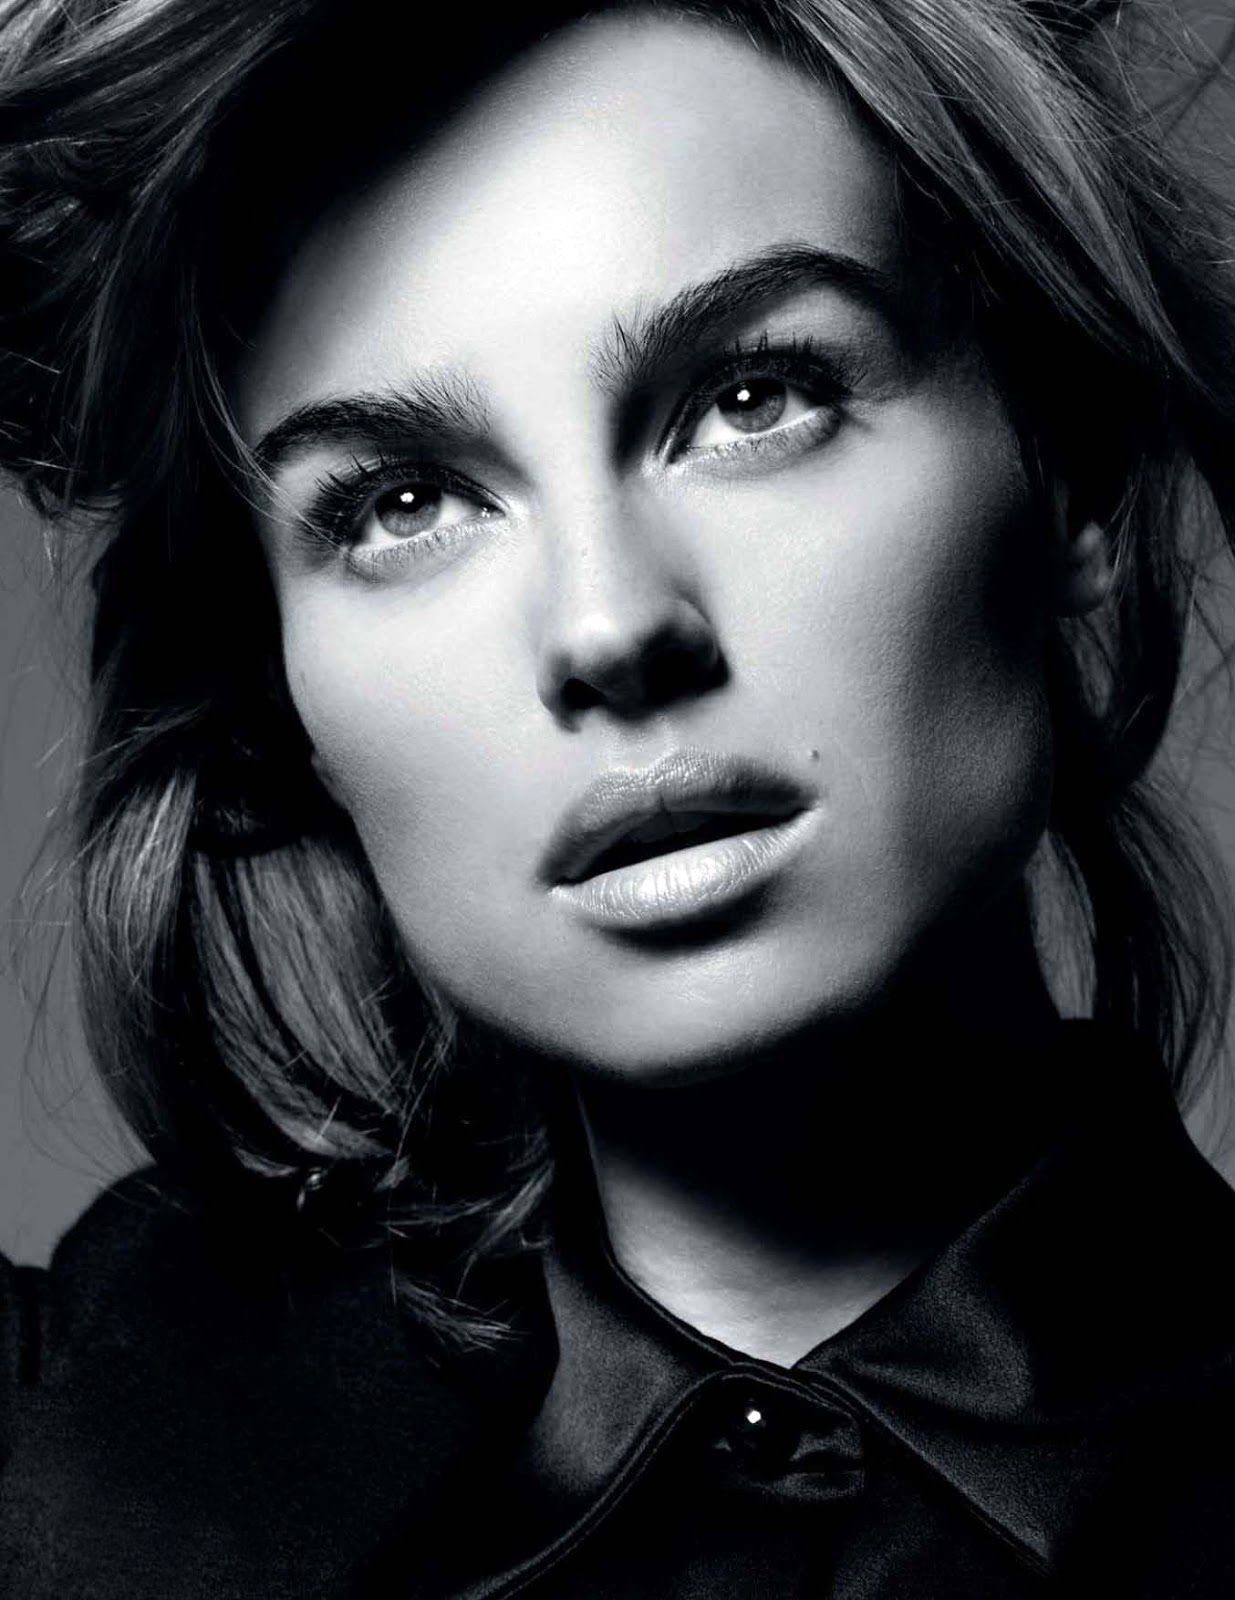 Kasia Smutniak | L'Officiel, Novembre 2012